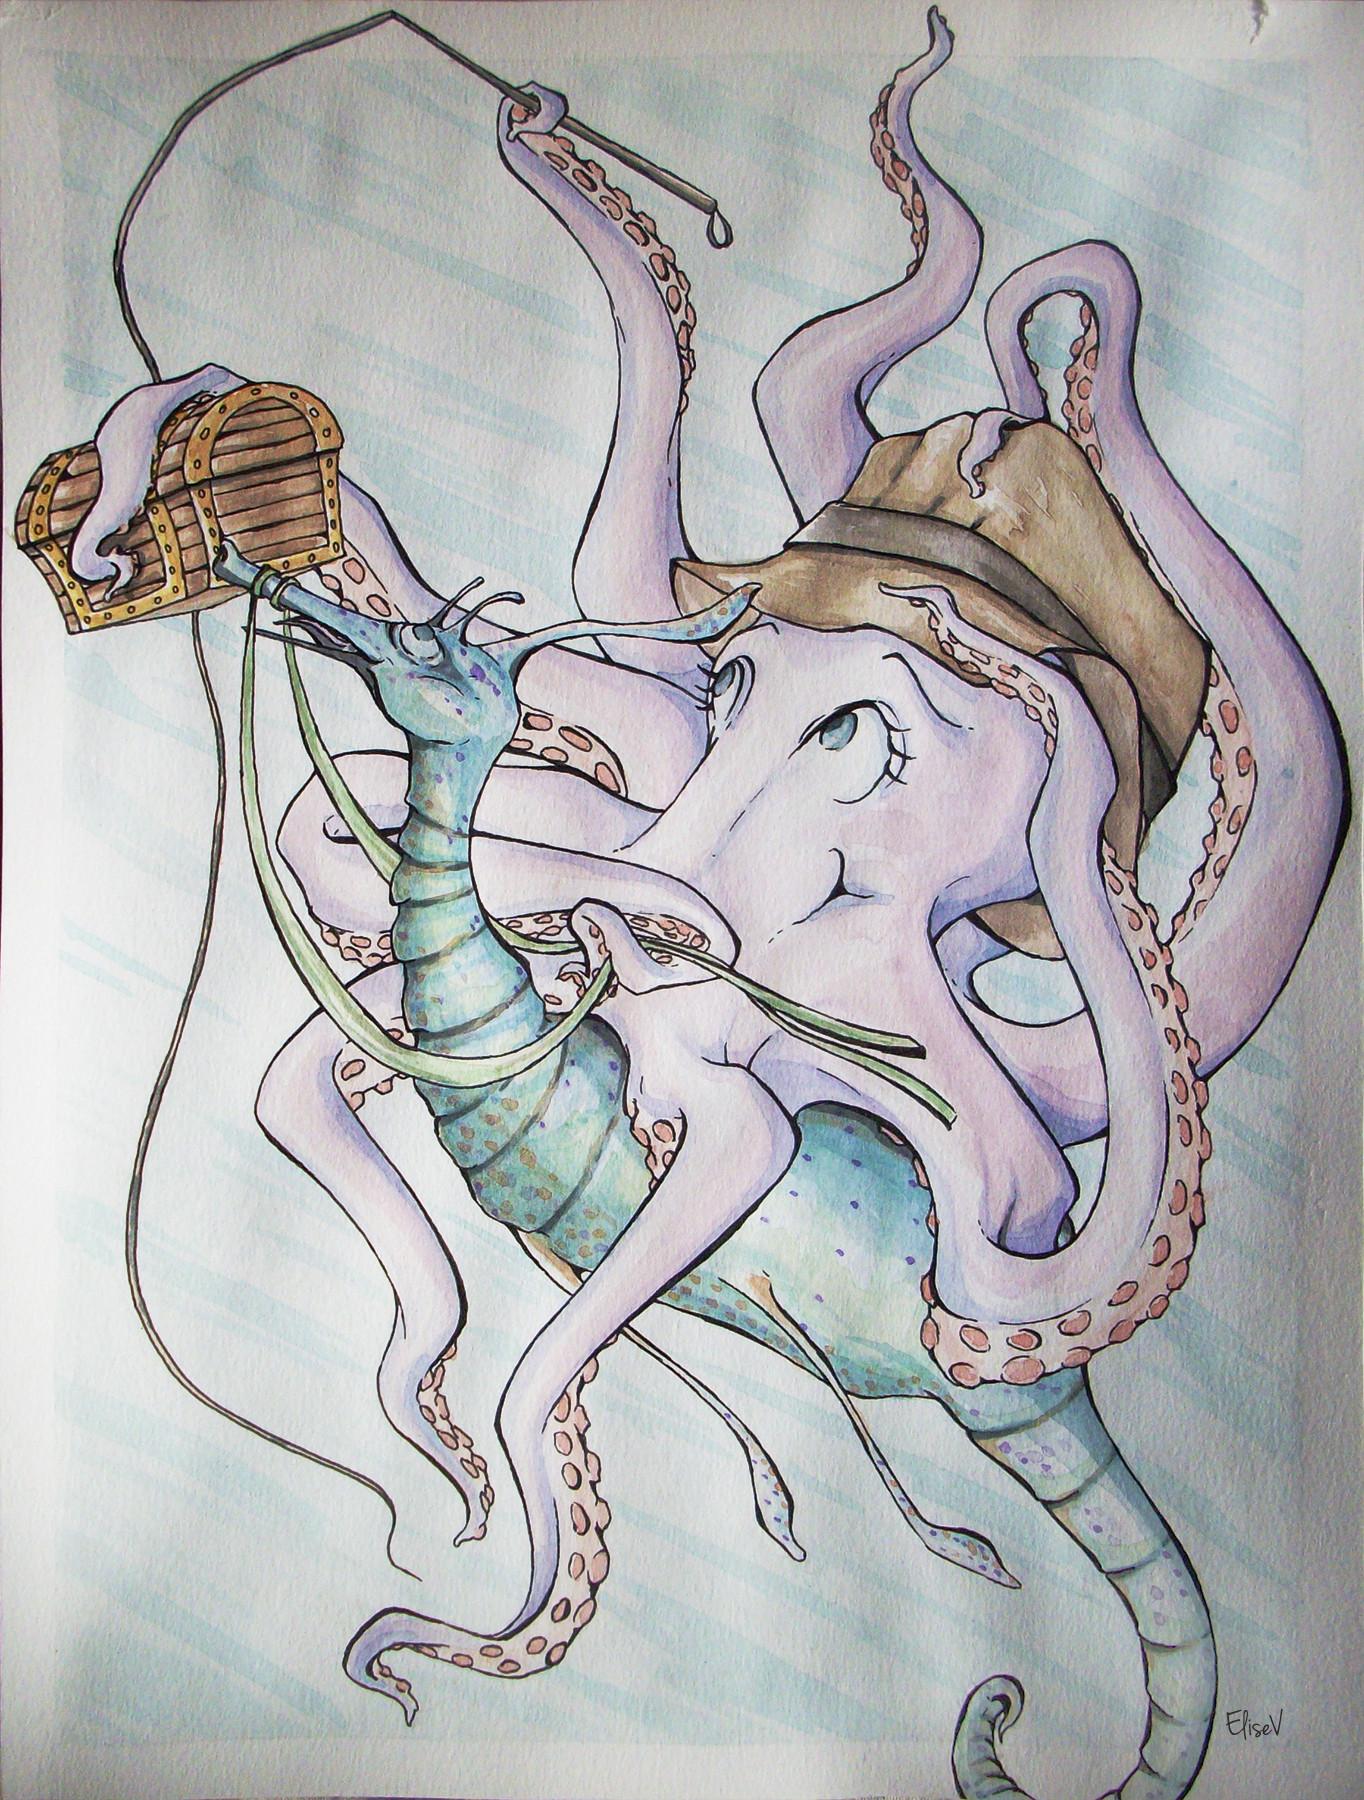 e-v-14-pieuvre-aventuriere-5-p.jpg?1519203157